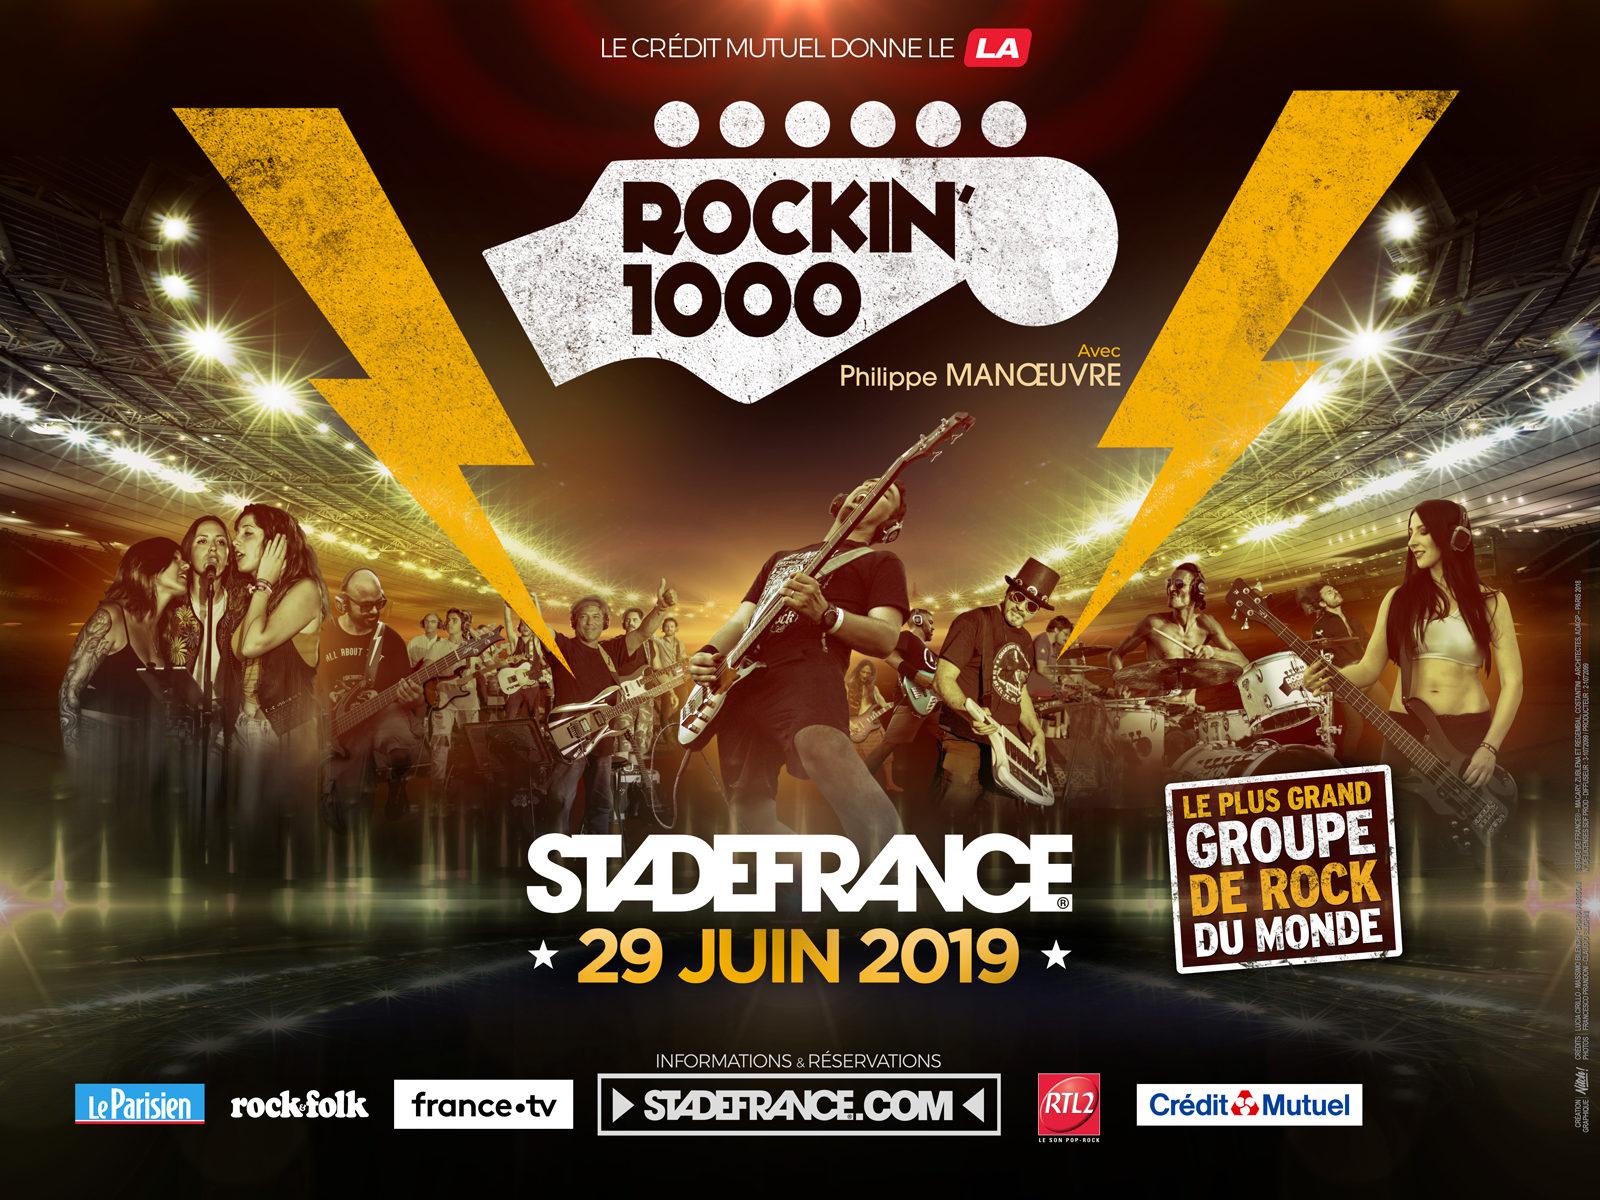 Rockin'1000 Stade de France